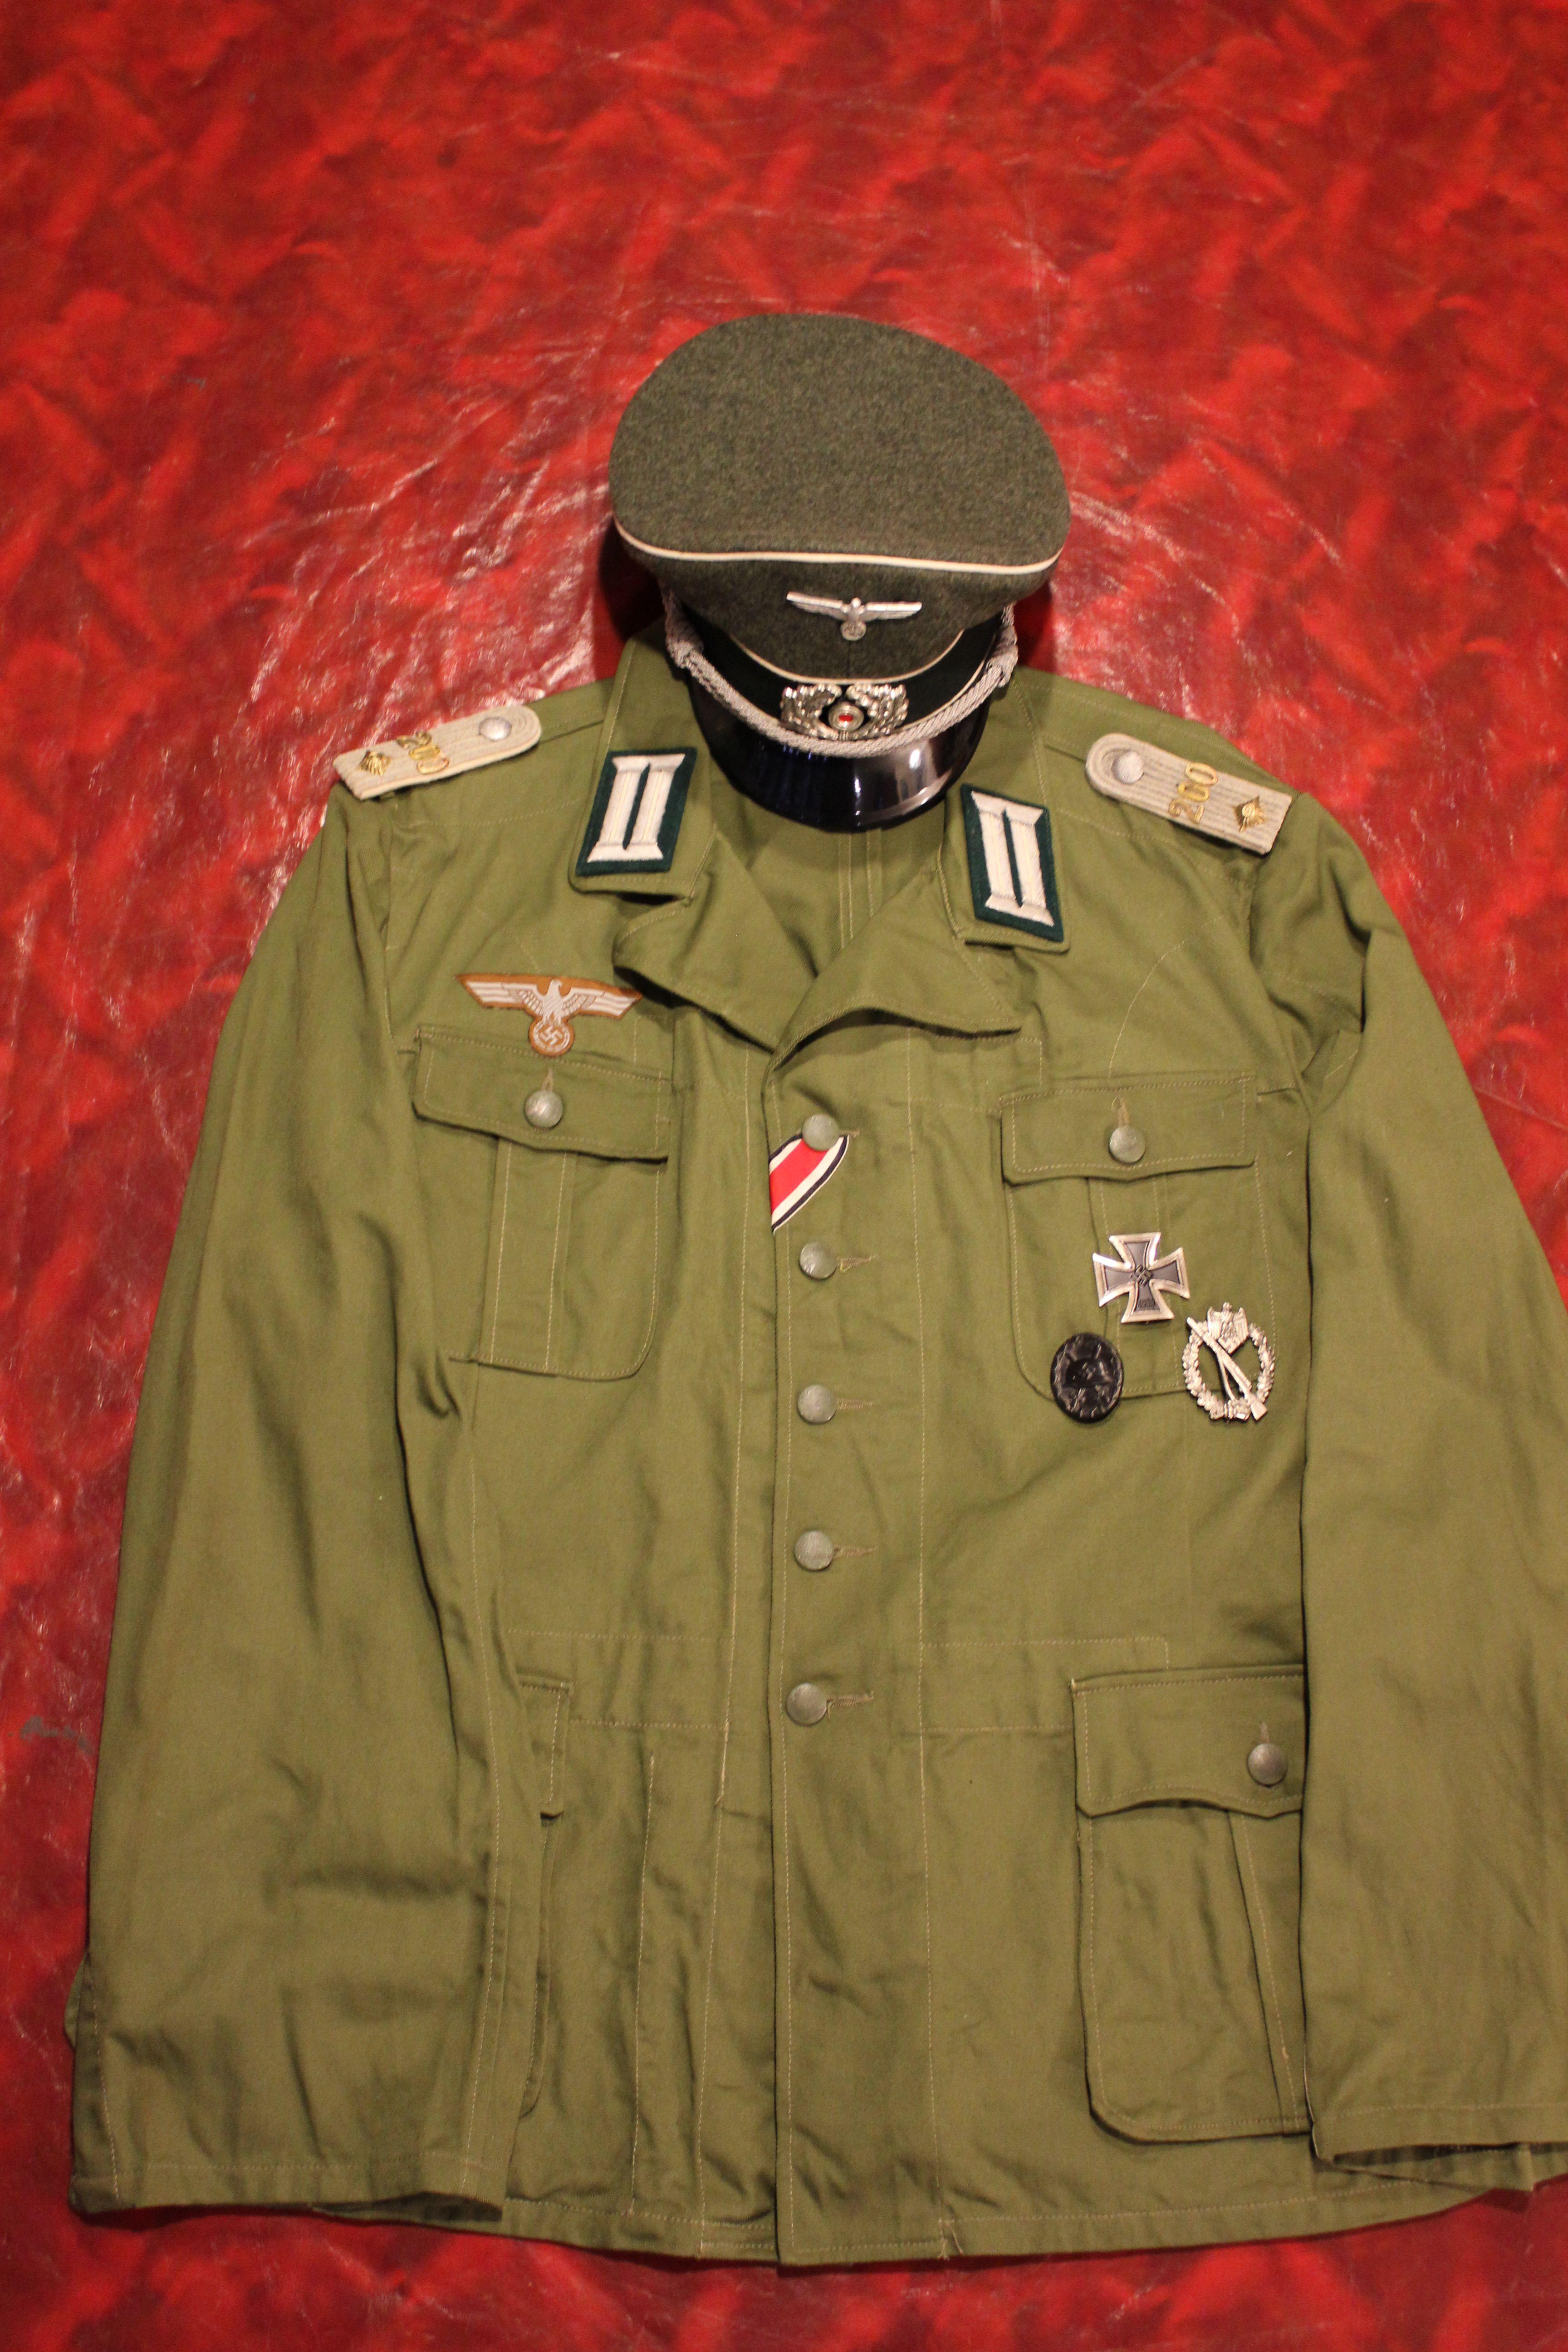 aaa0d4f1eca DAK Officer, Inf. Rgt 200 | Военна история / Military hystory ...